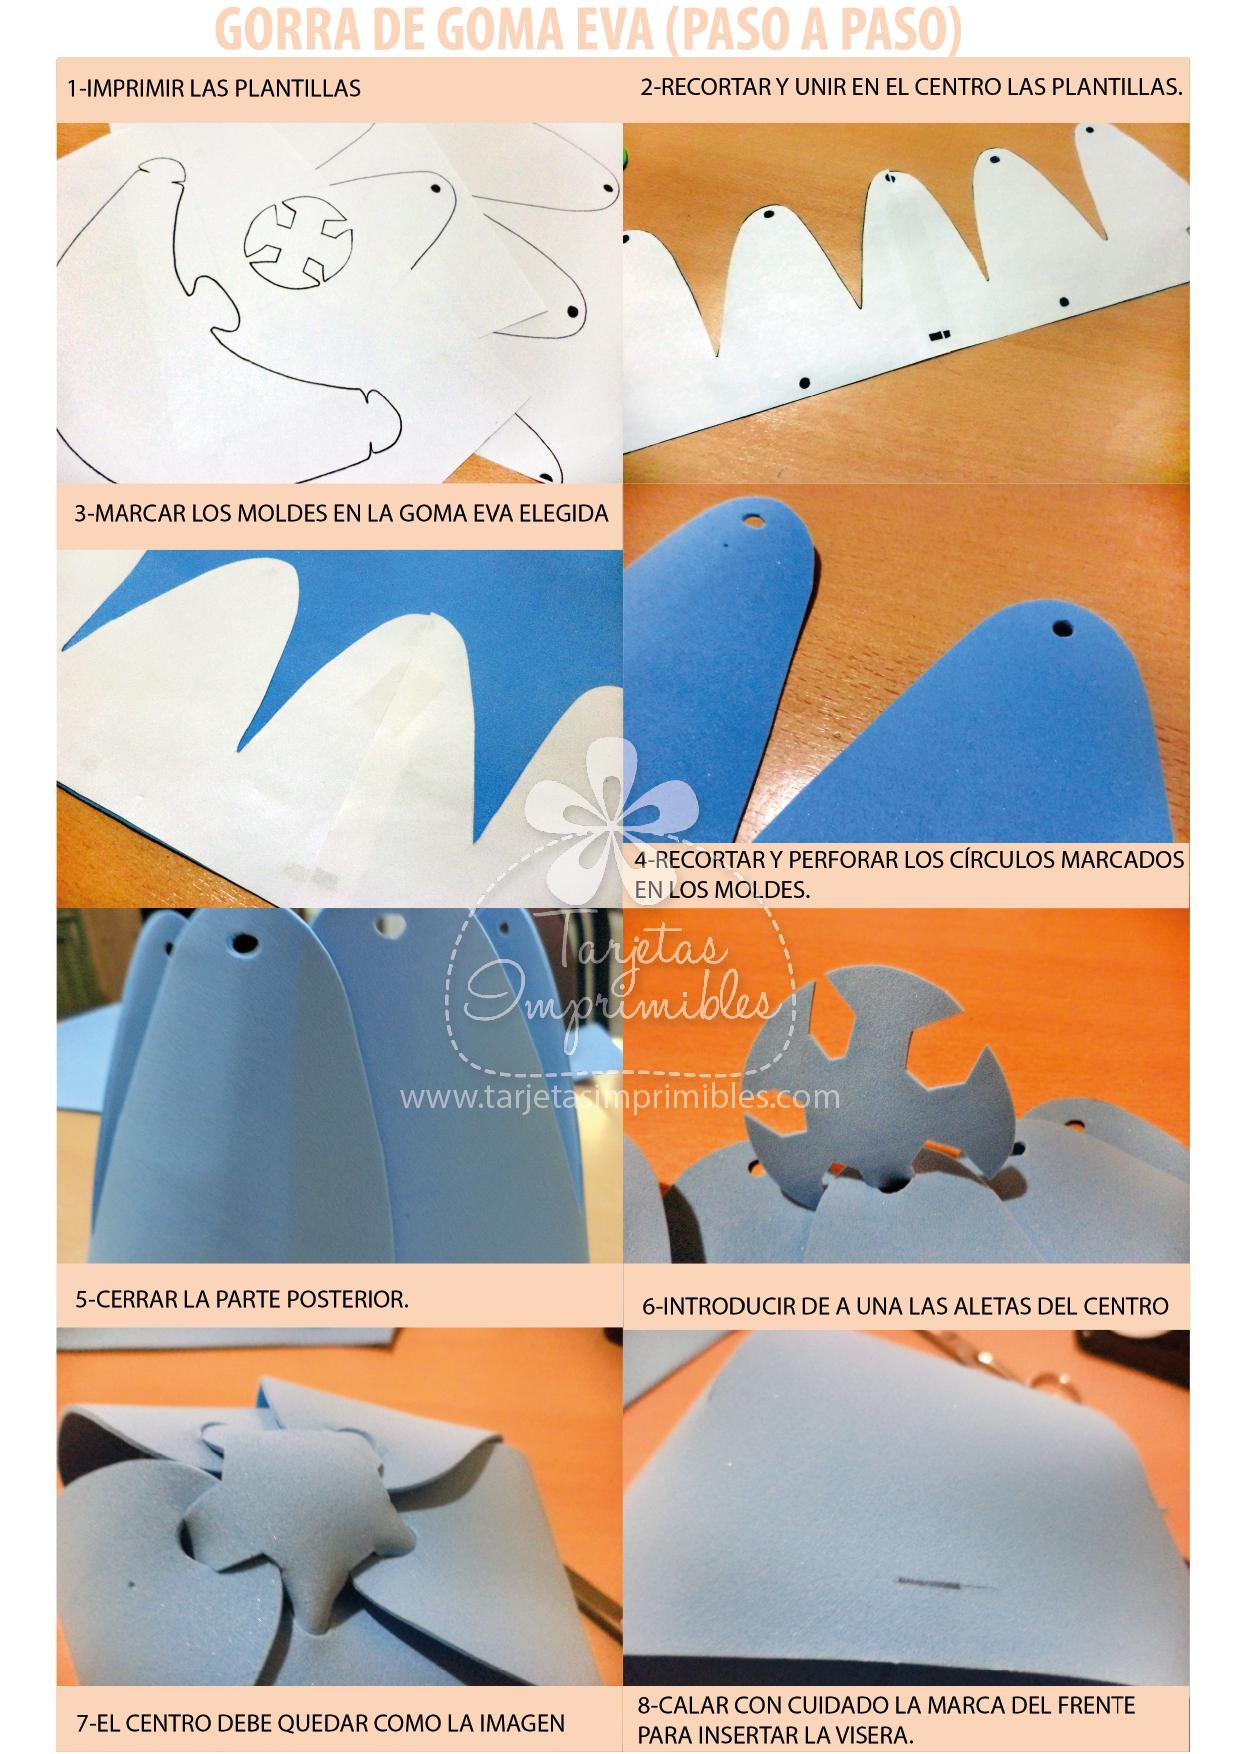 Sombreros o gorras de goma eva paso a paso y moldes  9f96286419f